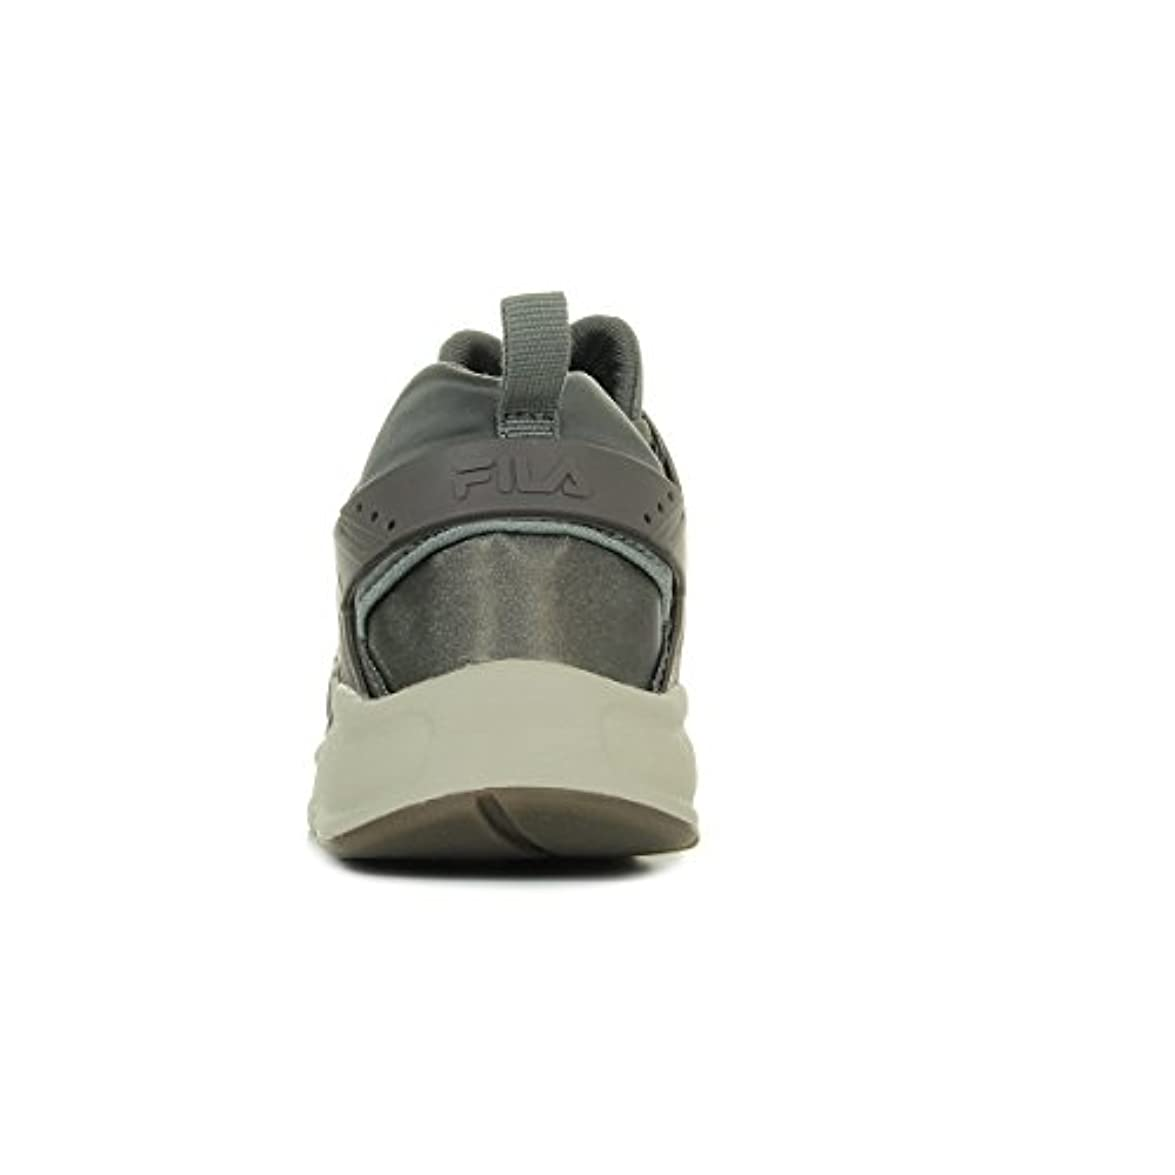 Fila Fleetwood M Low Wmn Taupe Gray 10101756bw Scarpe Sportive